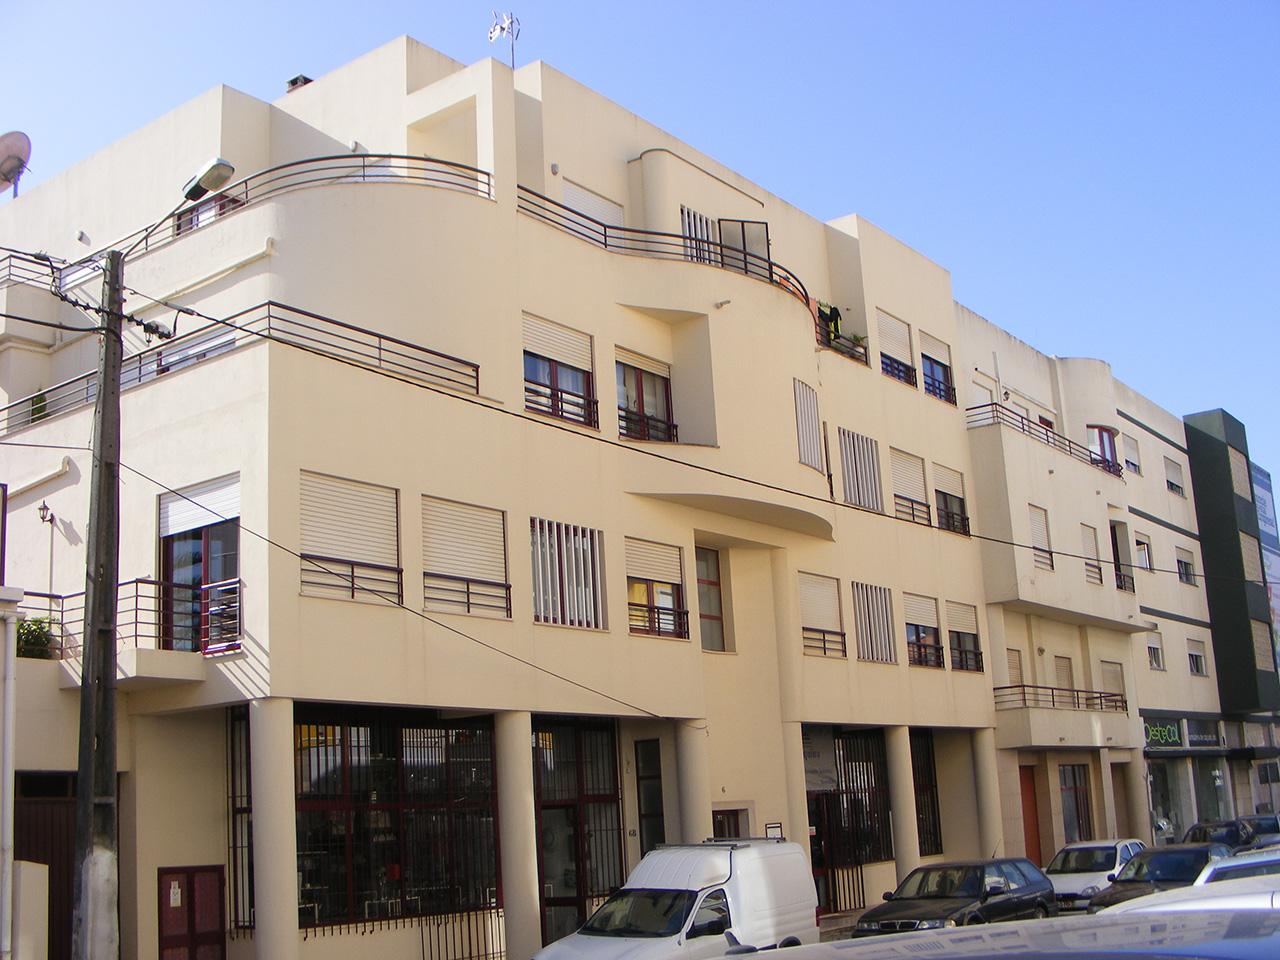 Edifício Multifamiliar – Rua Dr. Francisco Sá Carneiro – Benedita